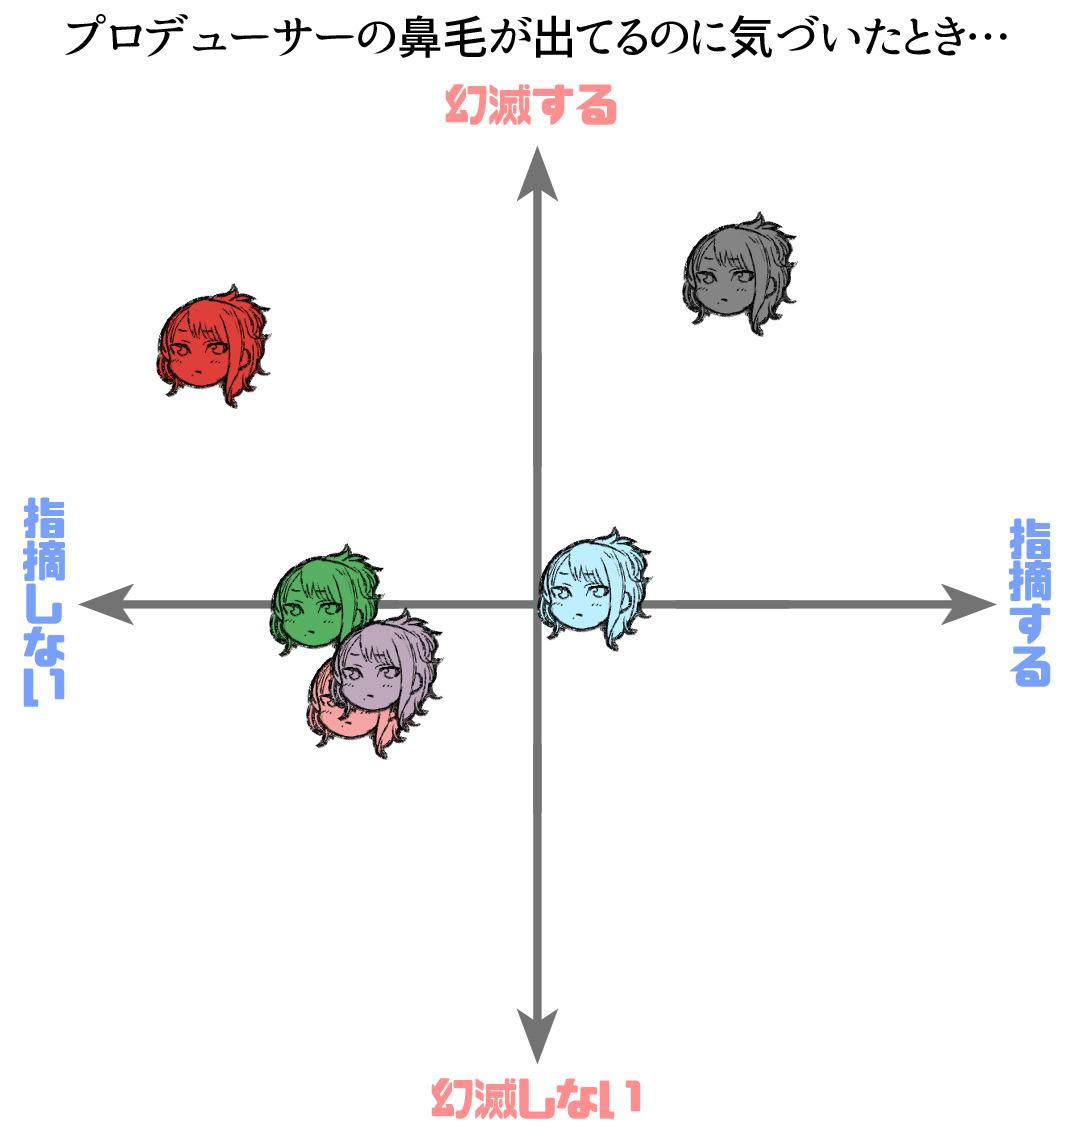 f:id:hoshi_sano:20200414111346j:image:w400